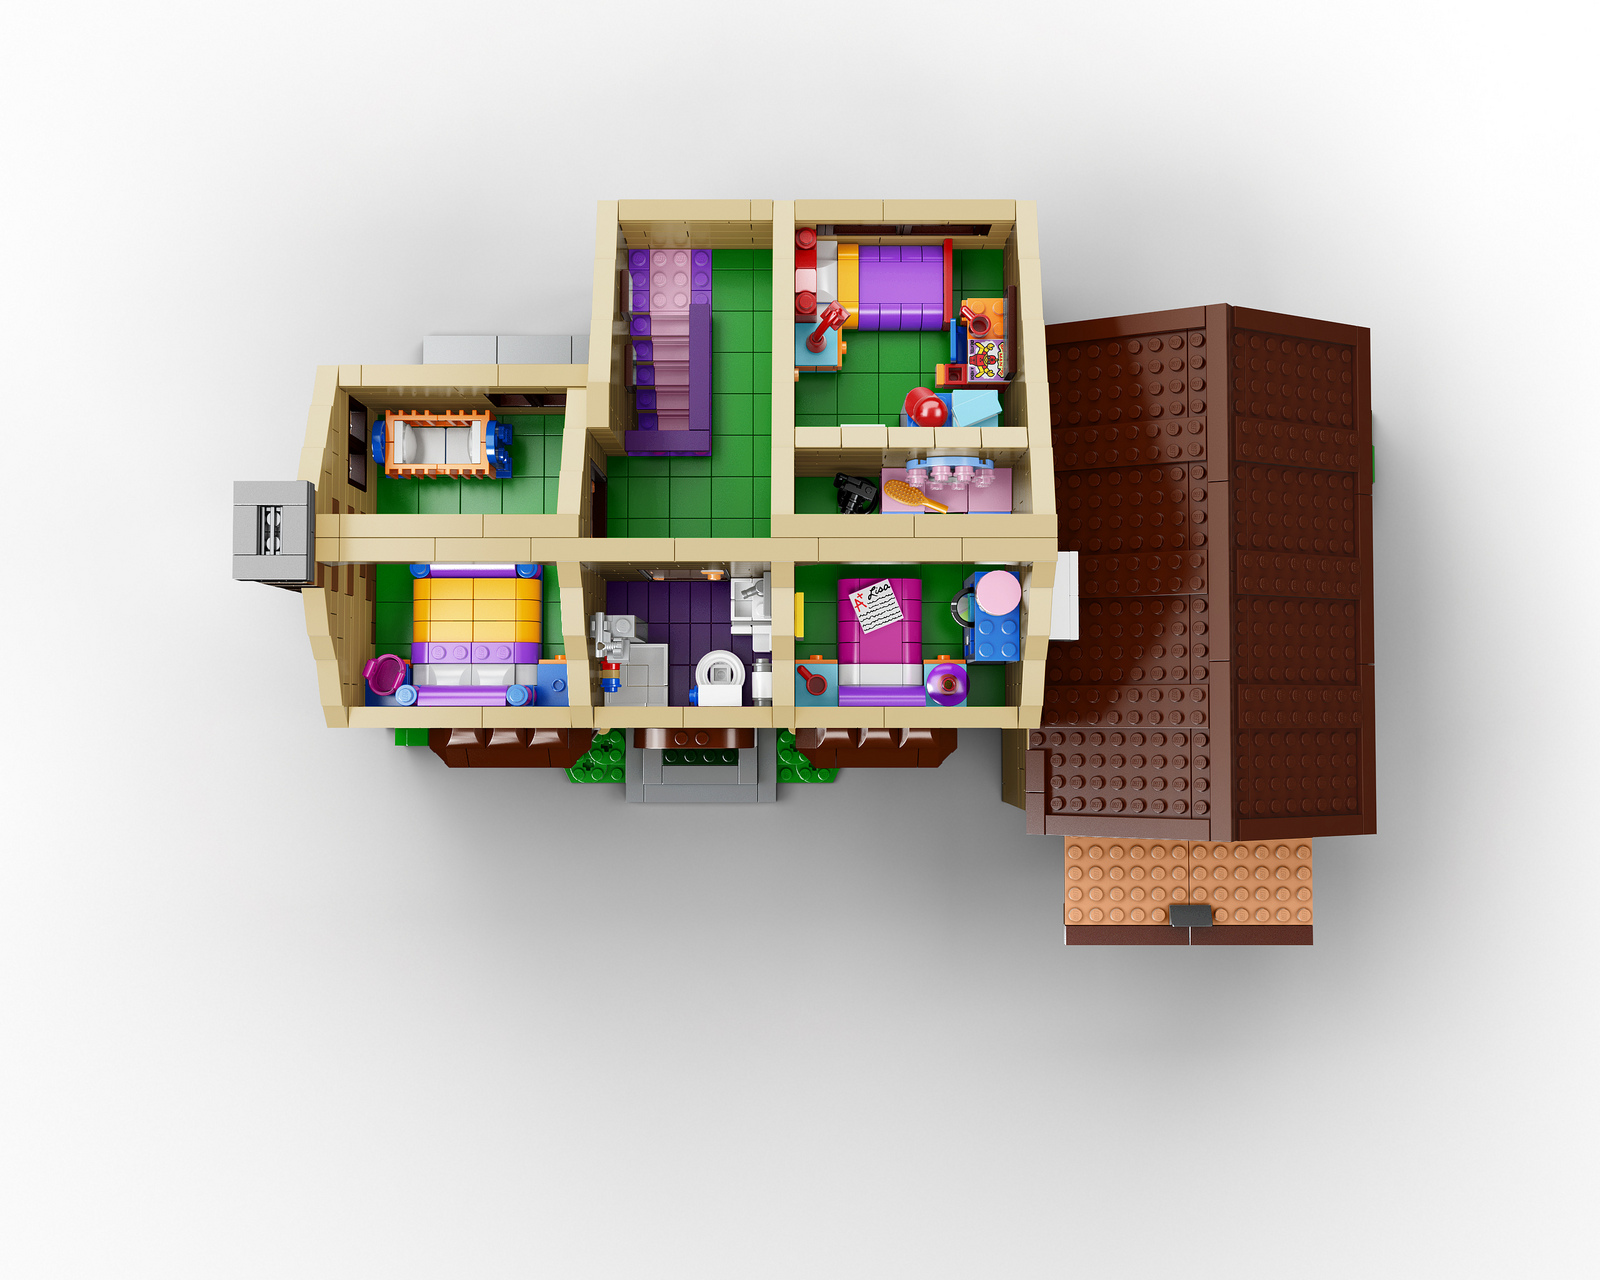 Maison-Lego-Simpsons-08